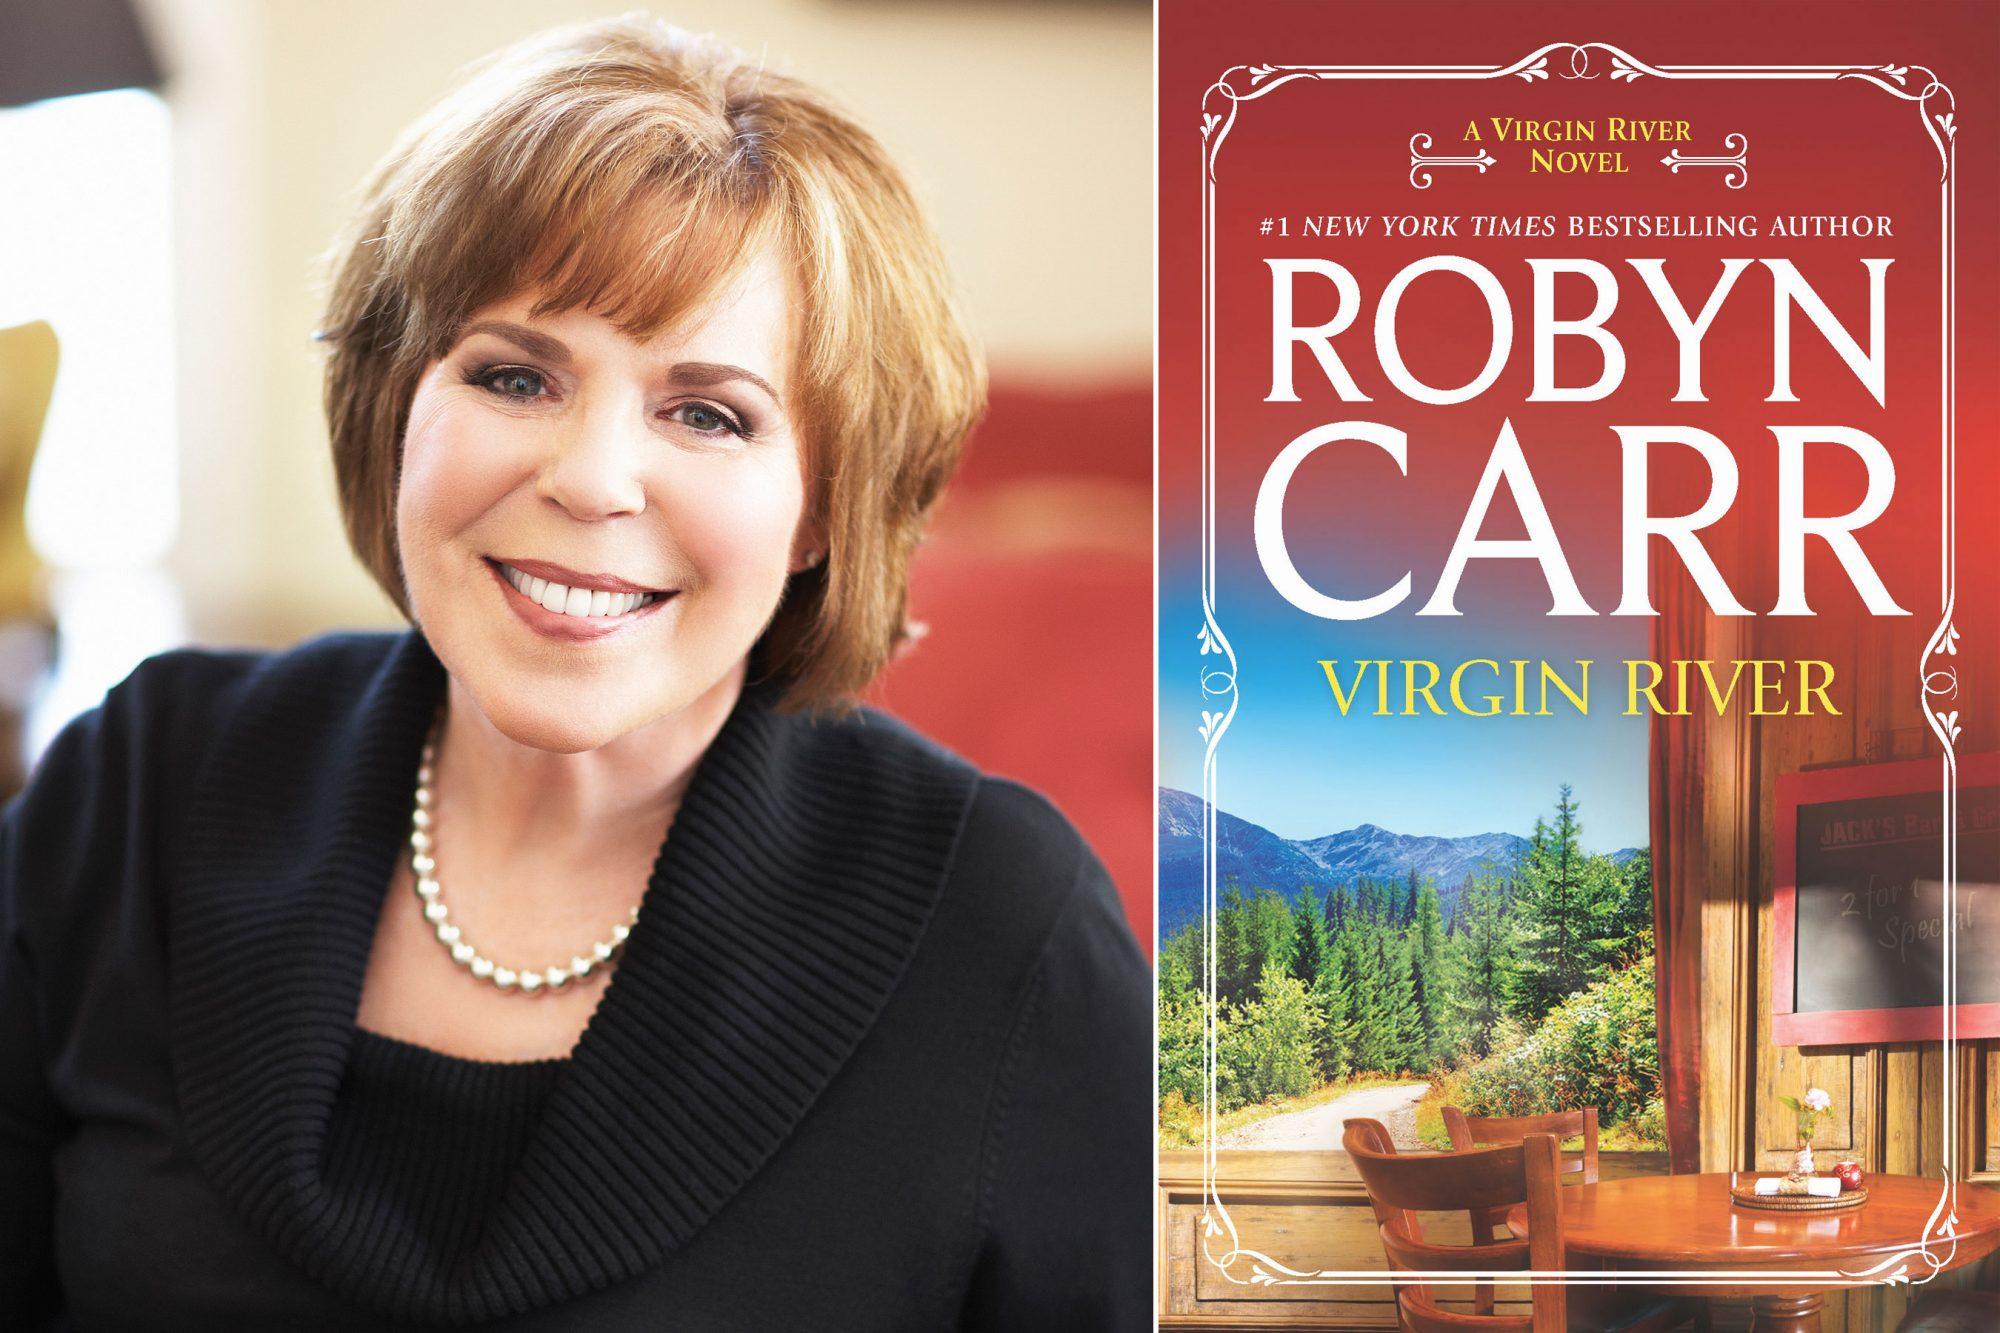 Robyn CarrCredit: Michael AlberstatRobyn Carr Virgin River